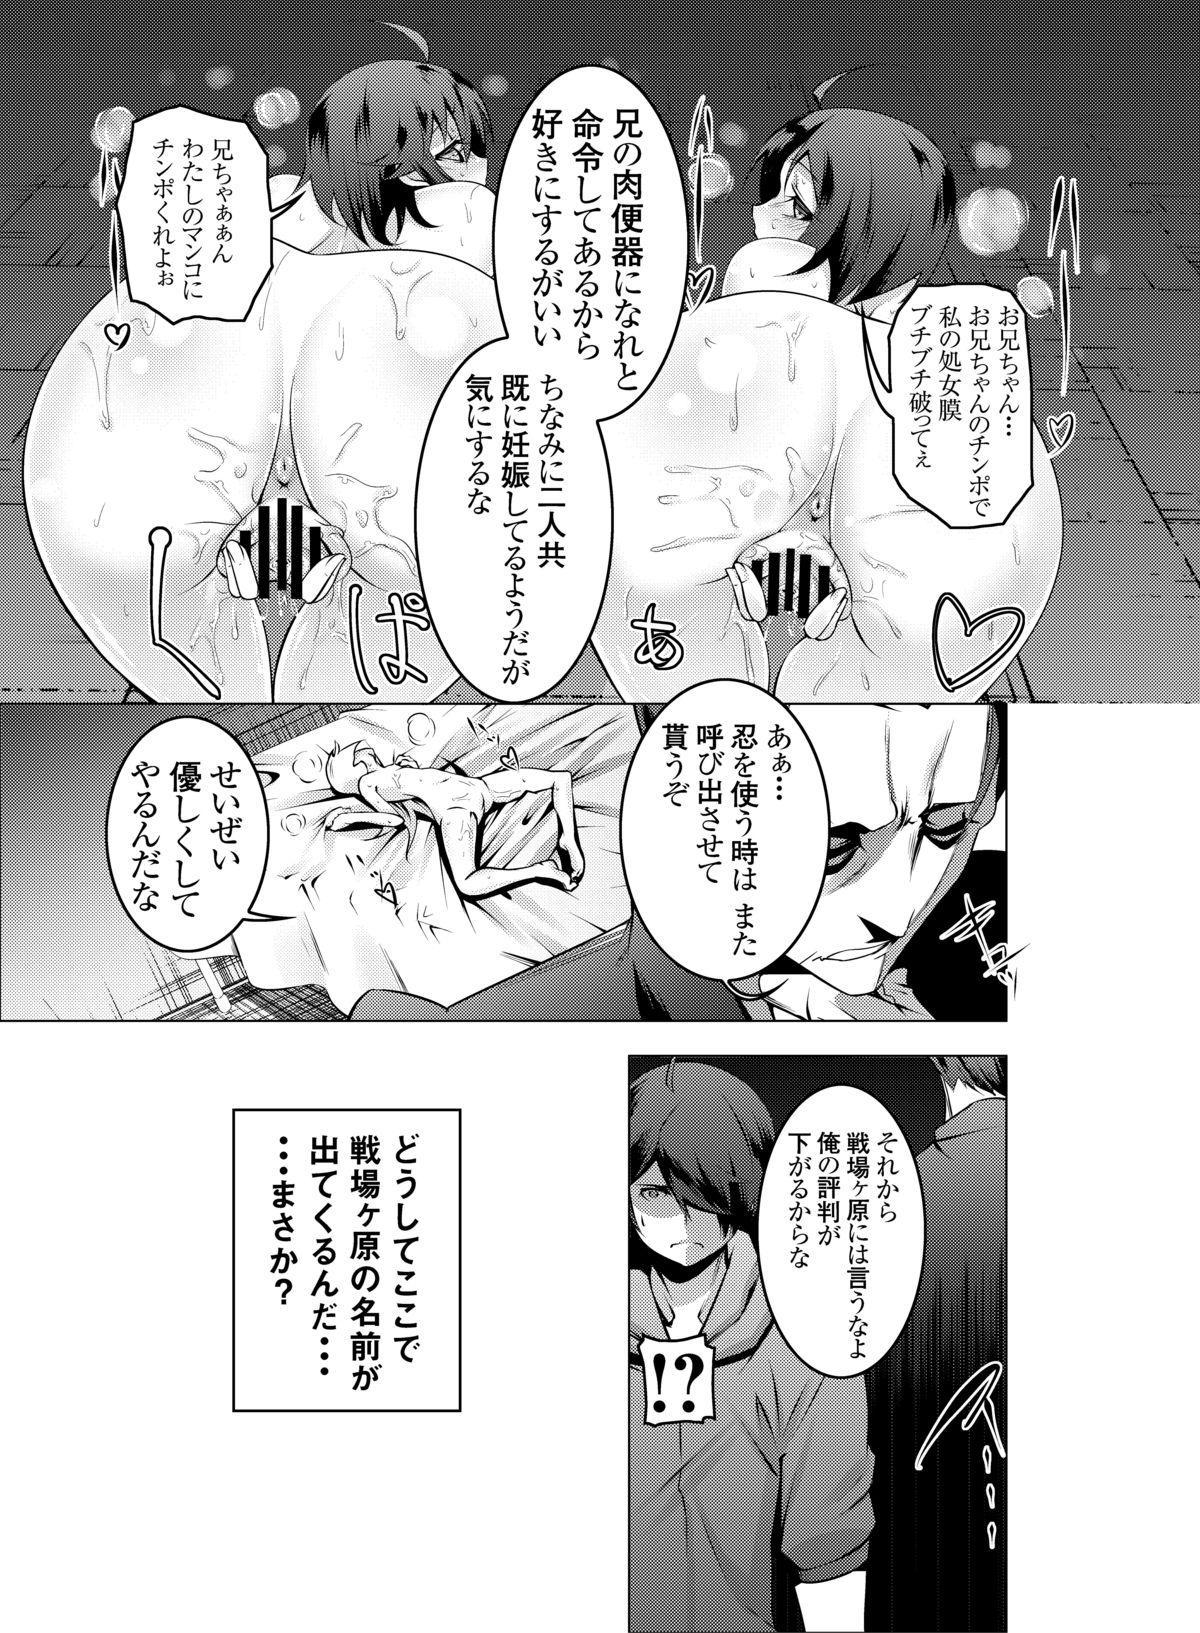 Netoraregatari 31